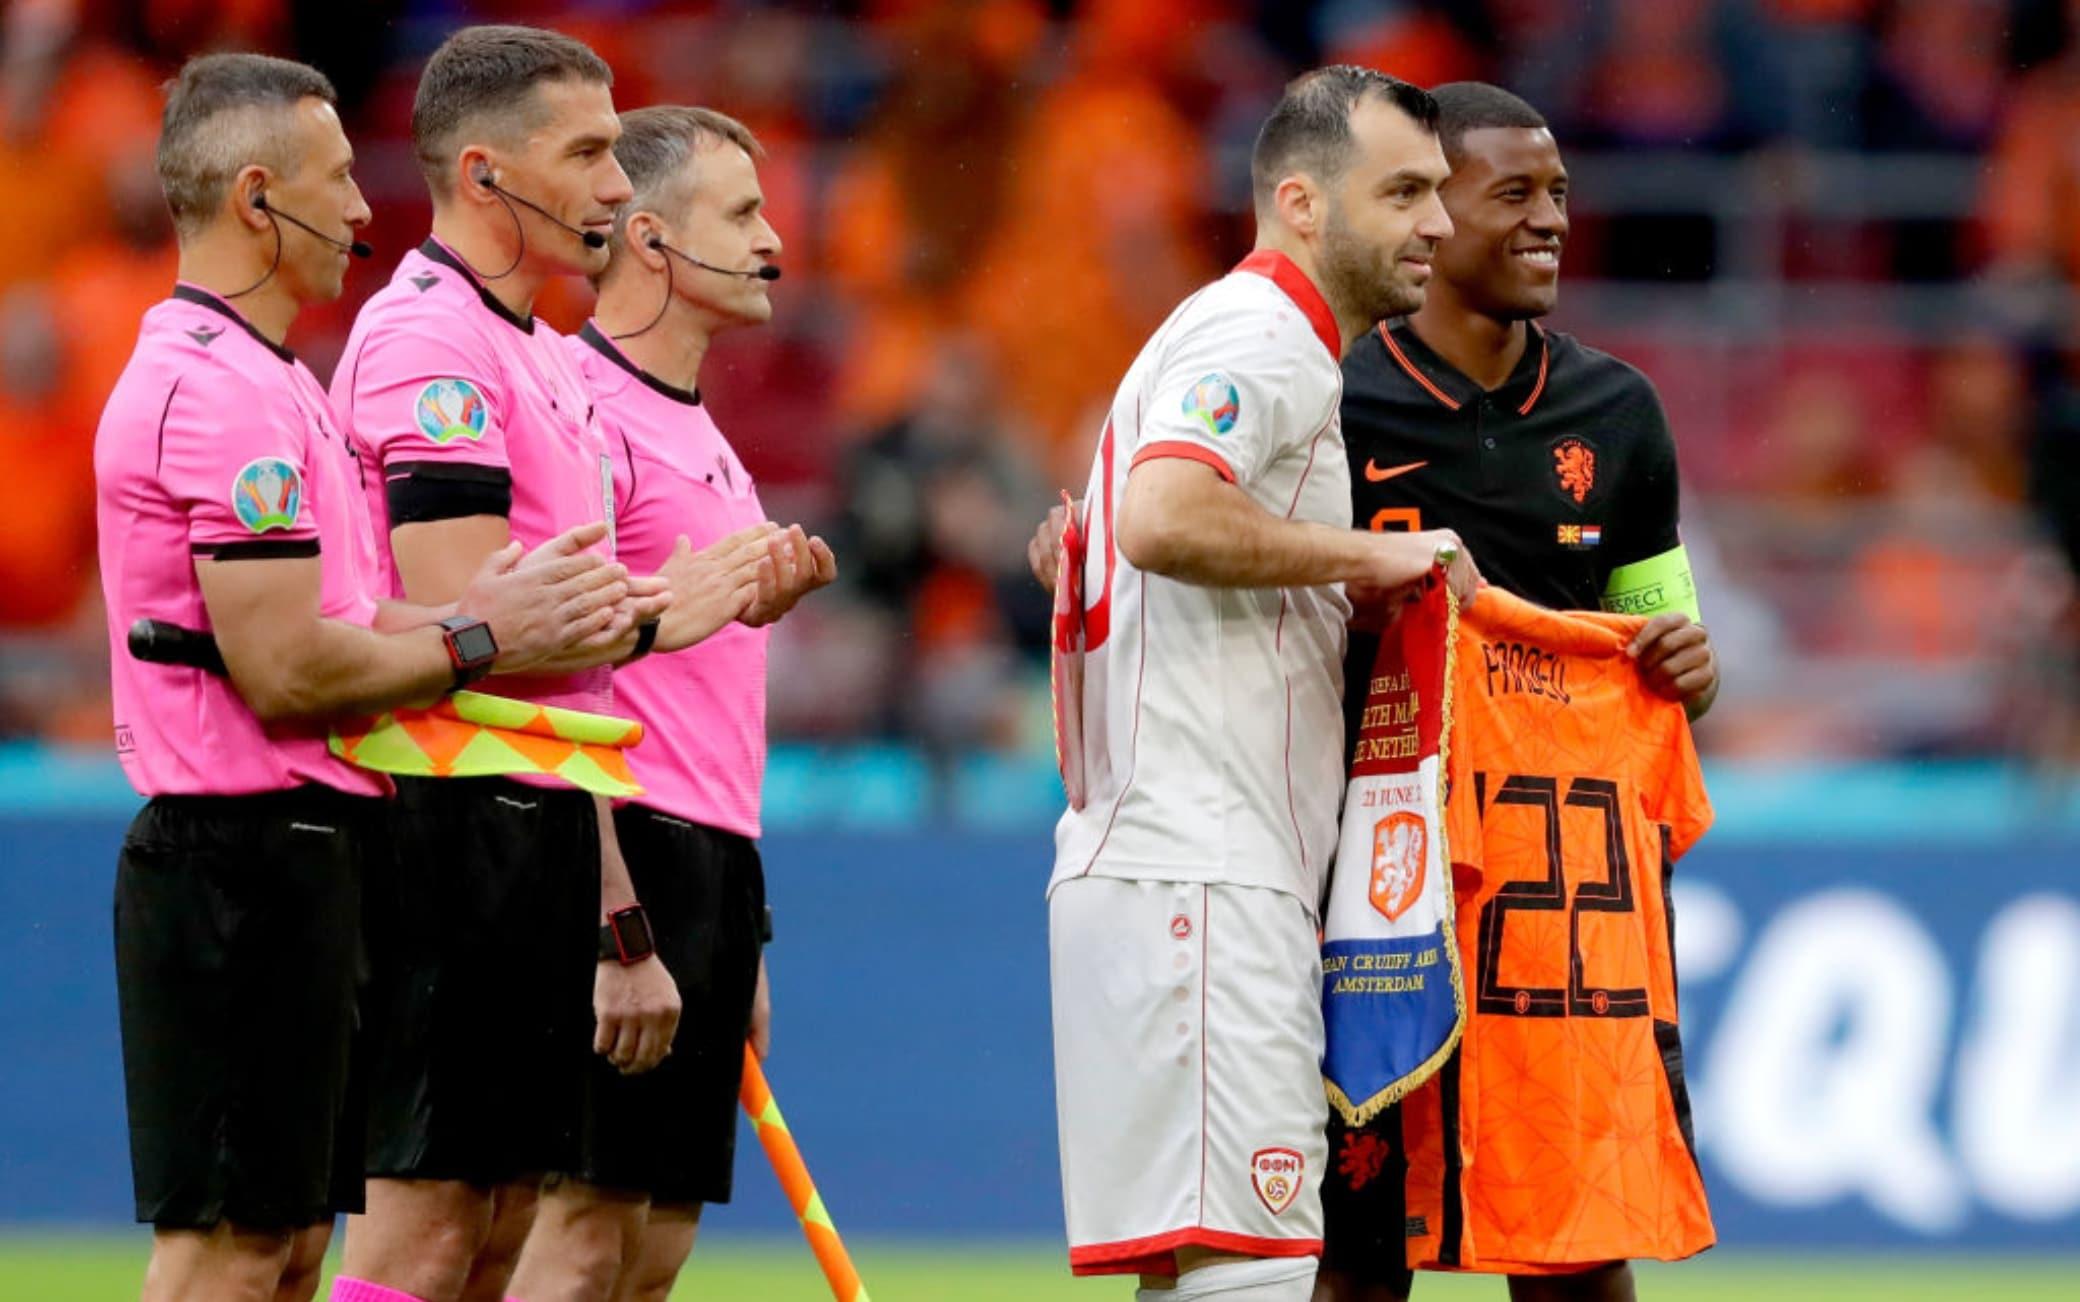 Pandev riceve una maglia speciale dagli avversari olandesi